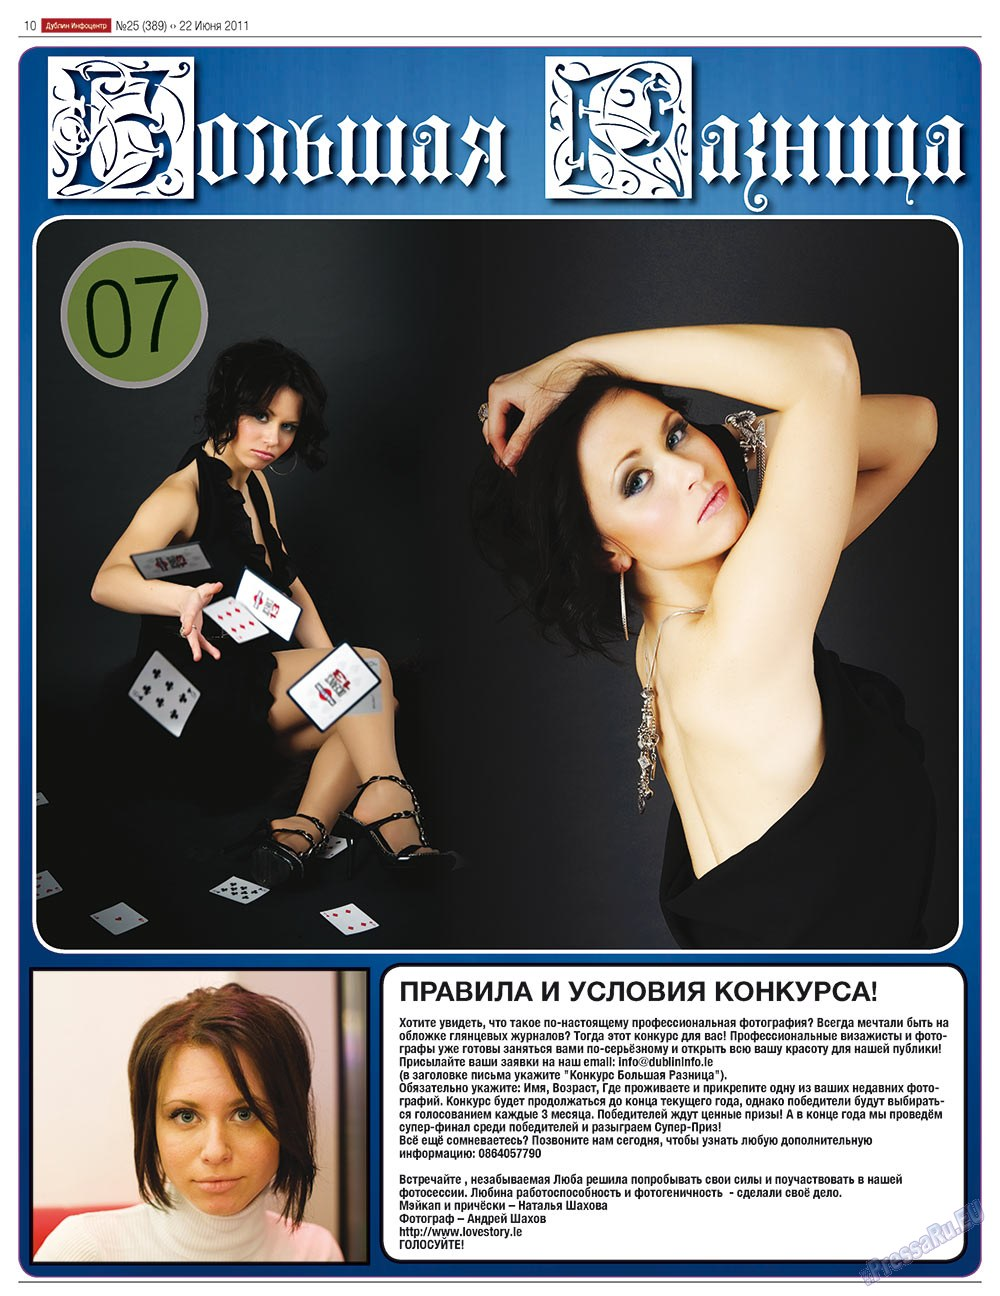 Дублин инфоцентр (газета). 2011 год, номер 25, стр. 10